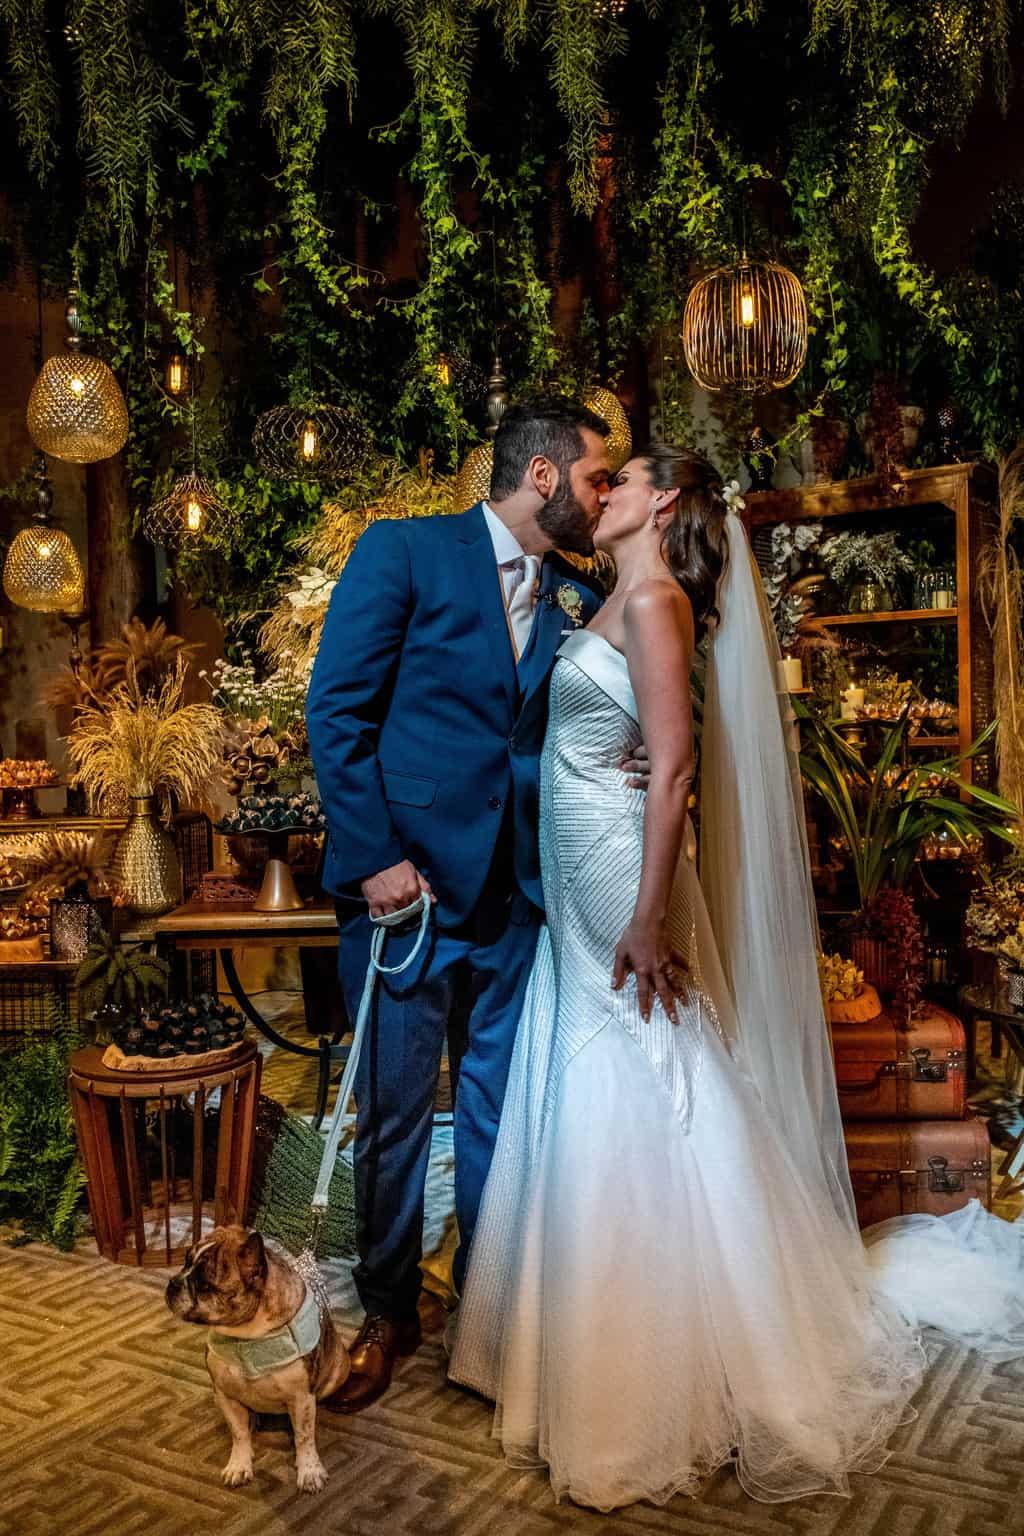 Bel-Benkler-eventos-Casamento-Ariane-e-Matheus-cerimonia-decoracao-contemporanea-fotografia-Rafael-Bigarelli-noivos-na-pista-Spazio-Giardini-70